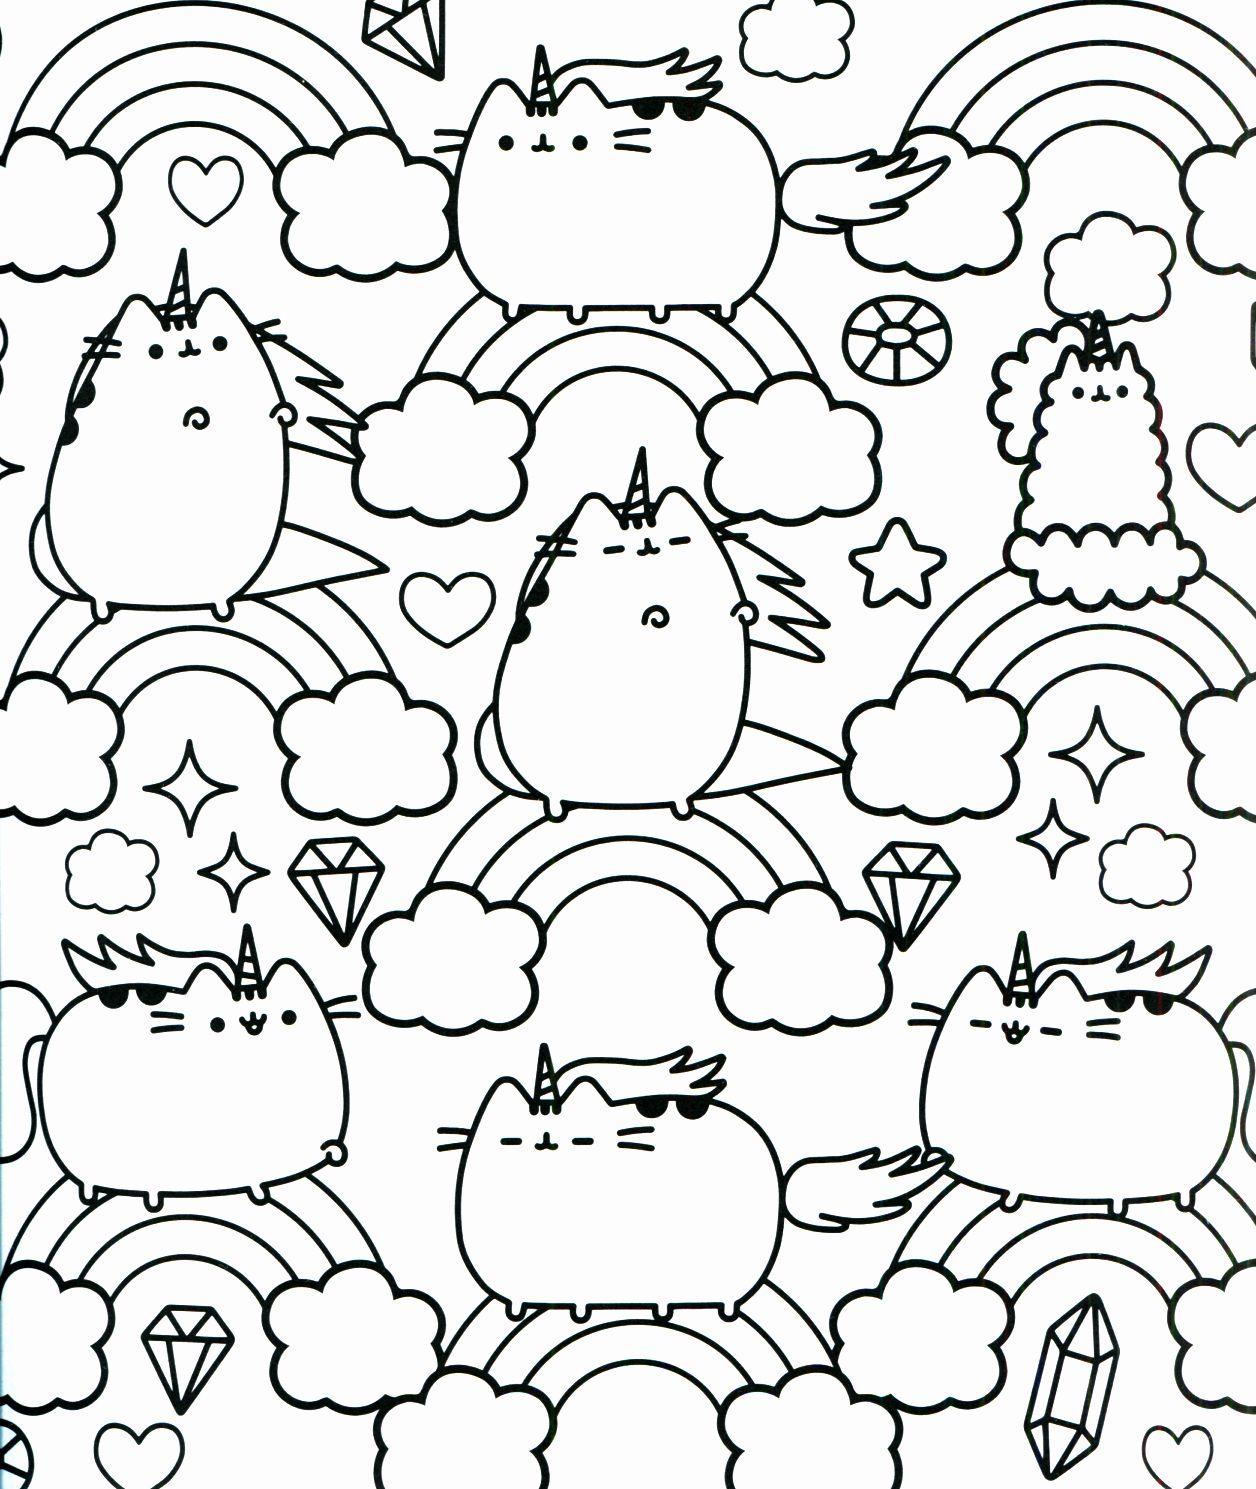 Kolorowanki Pusheen Szukaj W Google Unicorn Coloring Pages Cat Coloring Page Cat Coloring Book